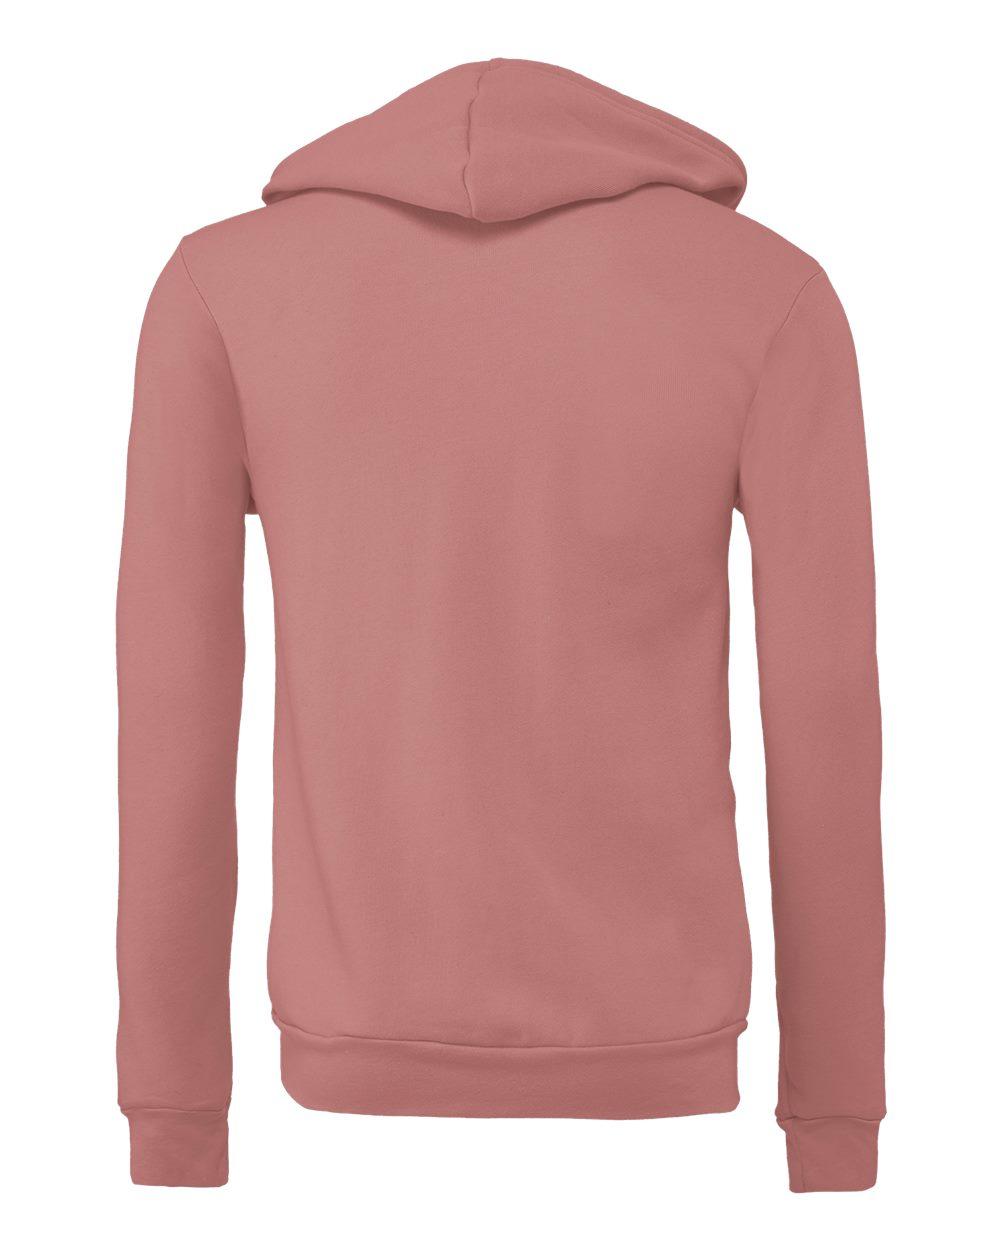 Bella-Canvas-Unisex-Full-Zip-Up-Hooded-Sweatshirt-Blank-Hoodie-3739-up-to-3XL thumbnail 69